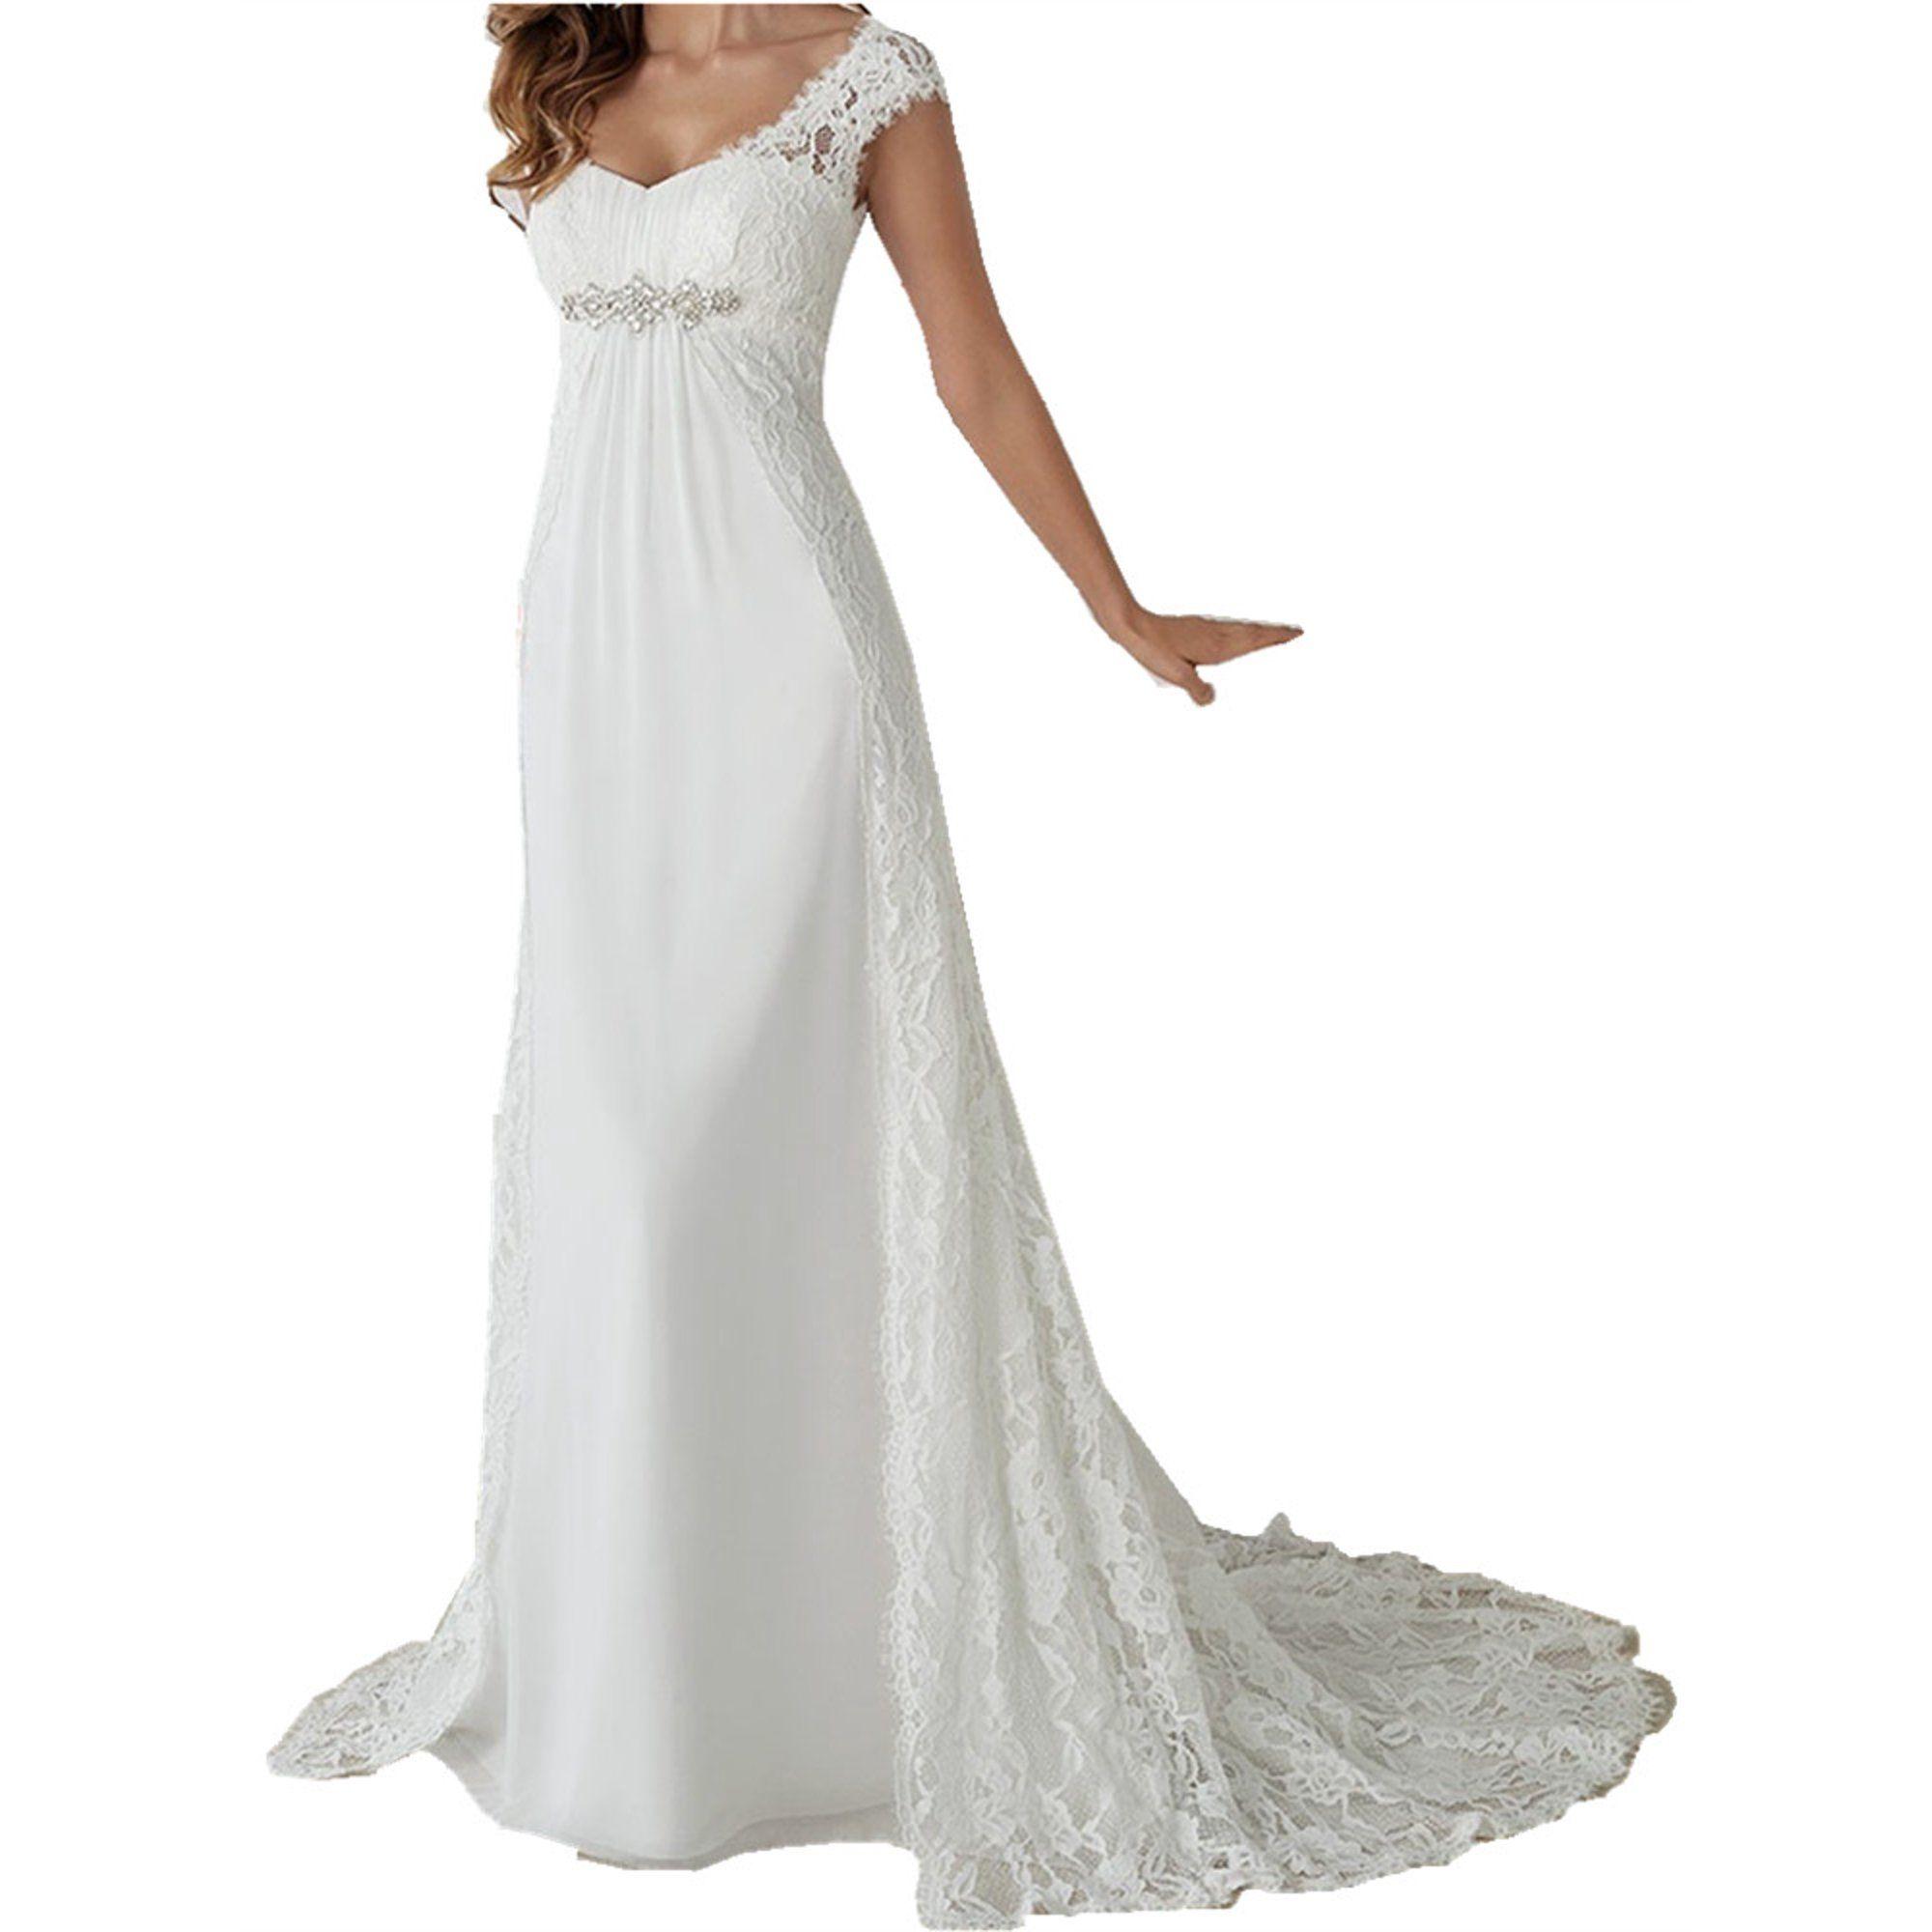 Sysea Lace Stitching Women White Pure Floor Length Wedding Dress Walmart Com Floor Length Wedding Dress Casual Beach Wedding Dress Buy Wedding Dress Online [ 2000 x 2000 Pixel ]